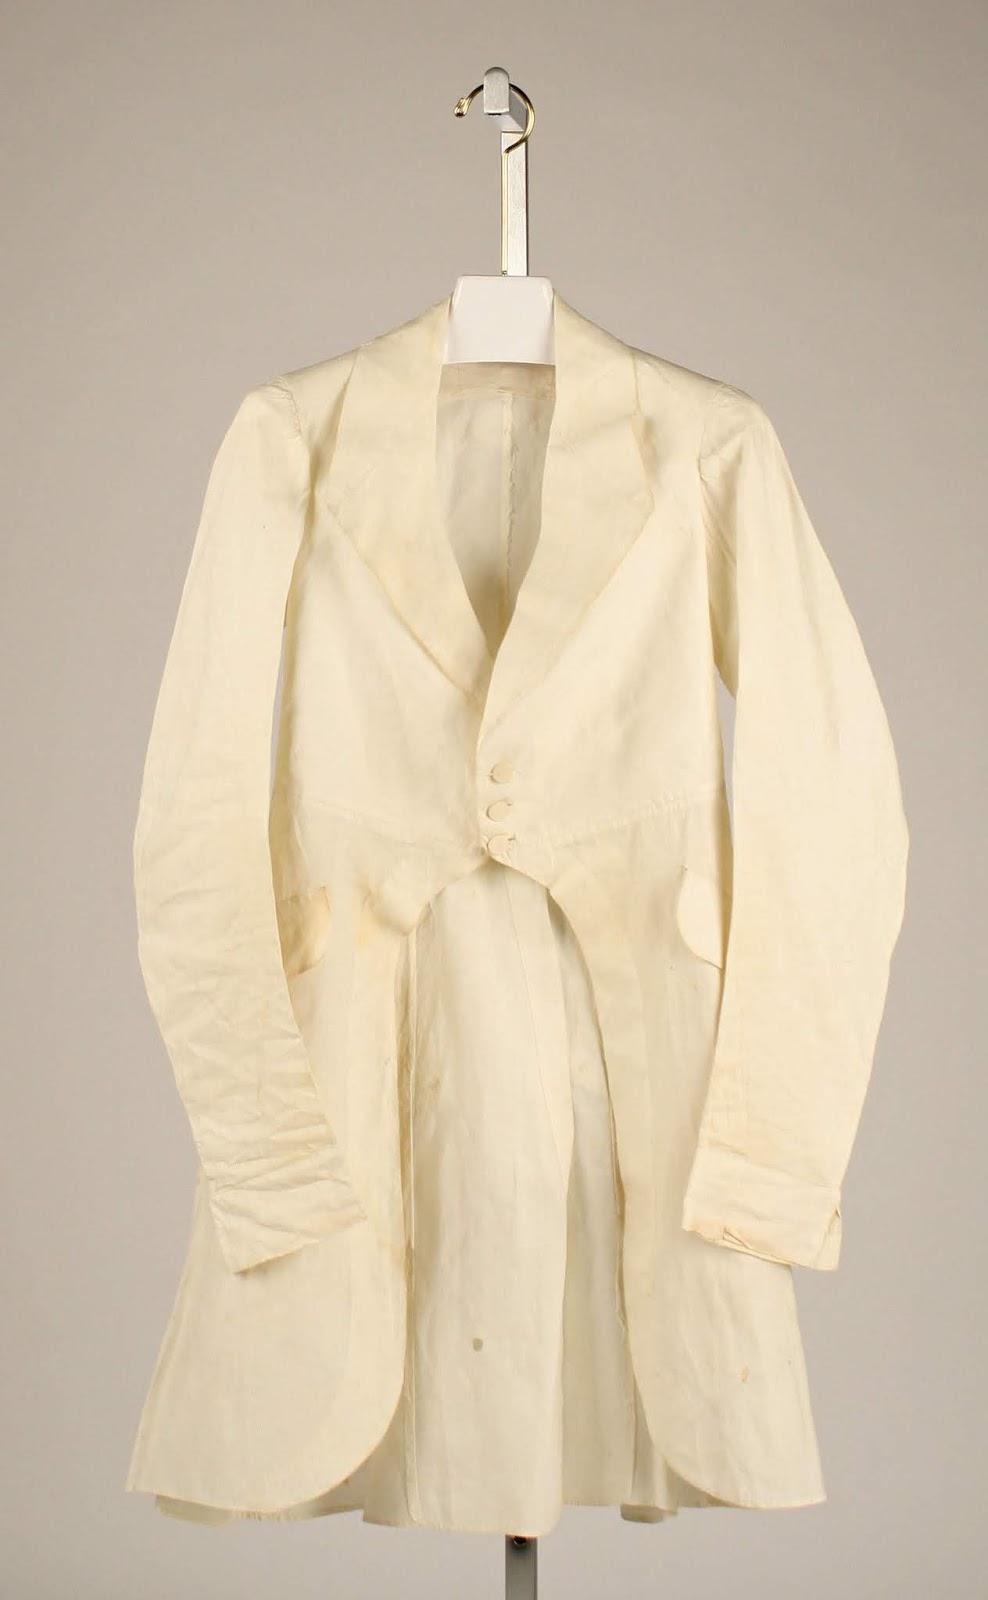 956edf3cf2 Marmota s Dress Diaries  HSM  19  2 Inspiration  Linen linens